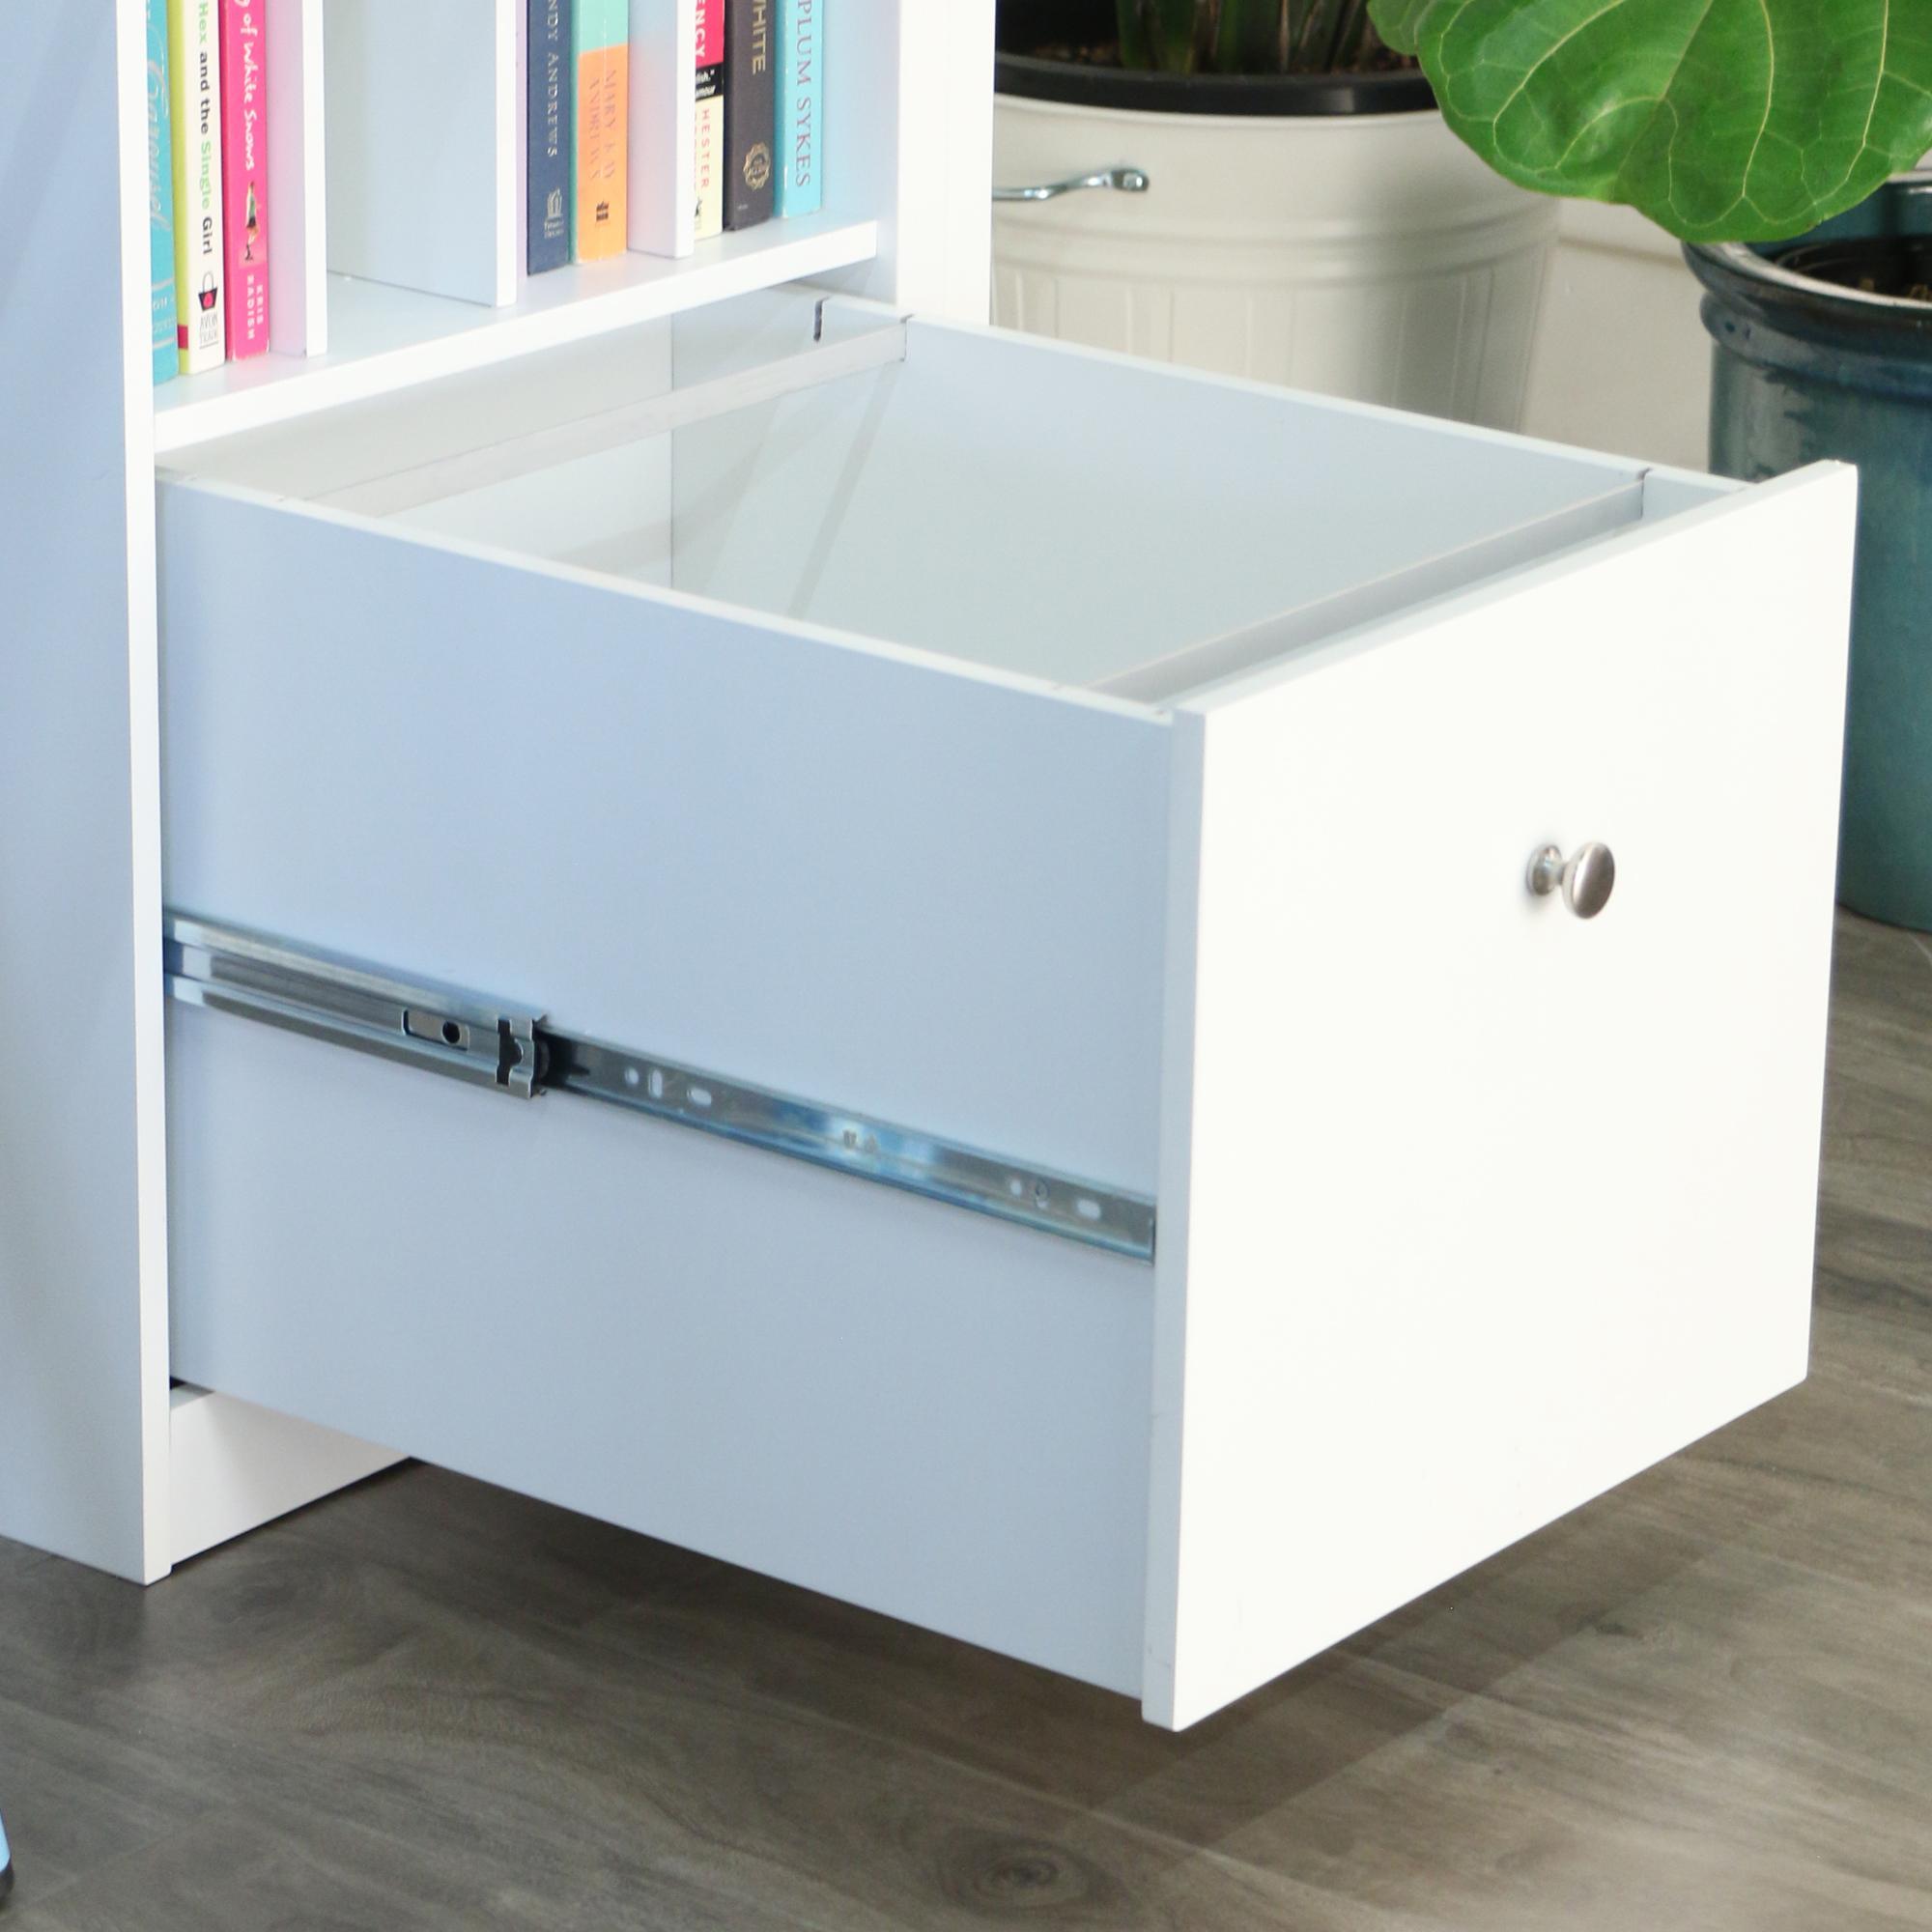 Amazon Com White Wood Deluxe Storage Computer Desk With